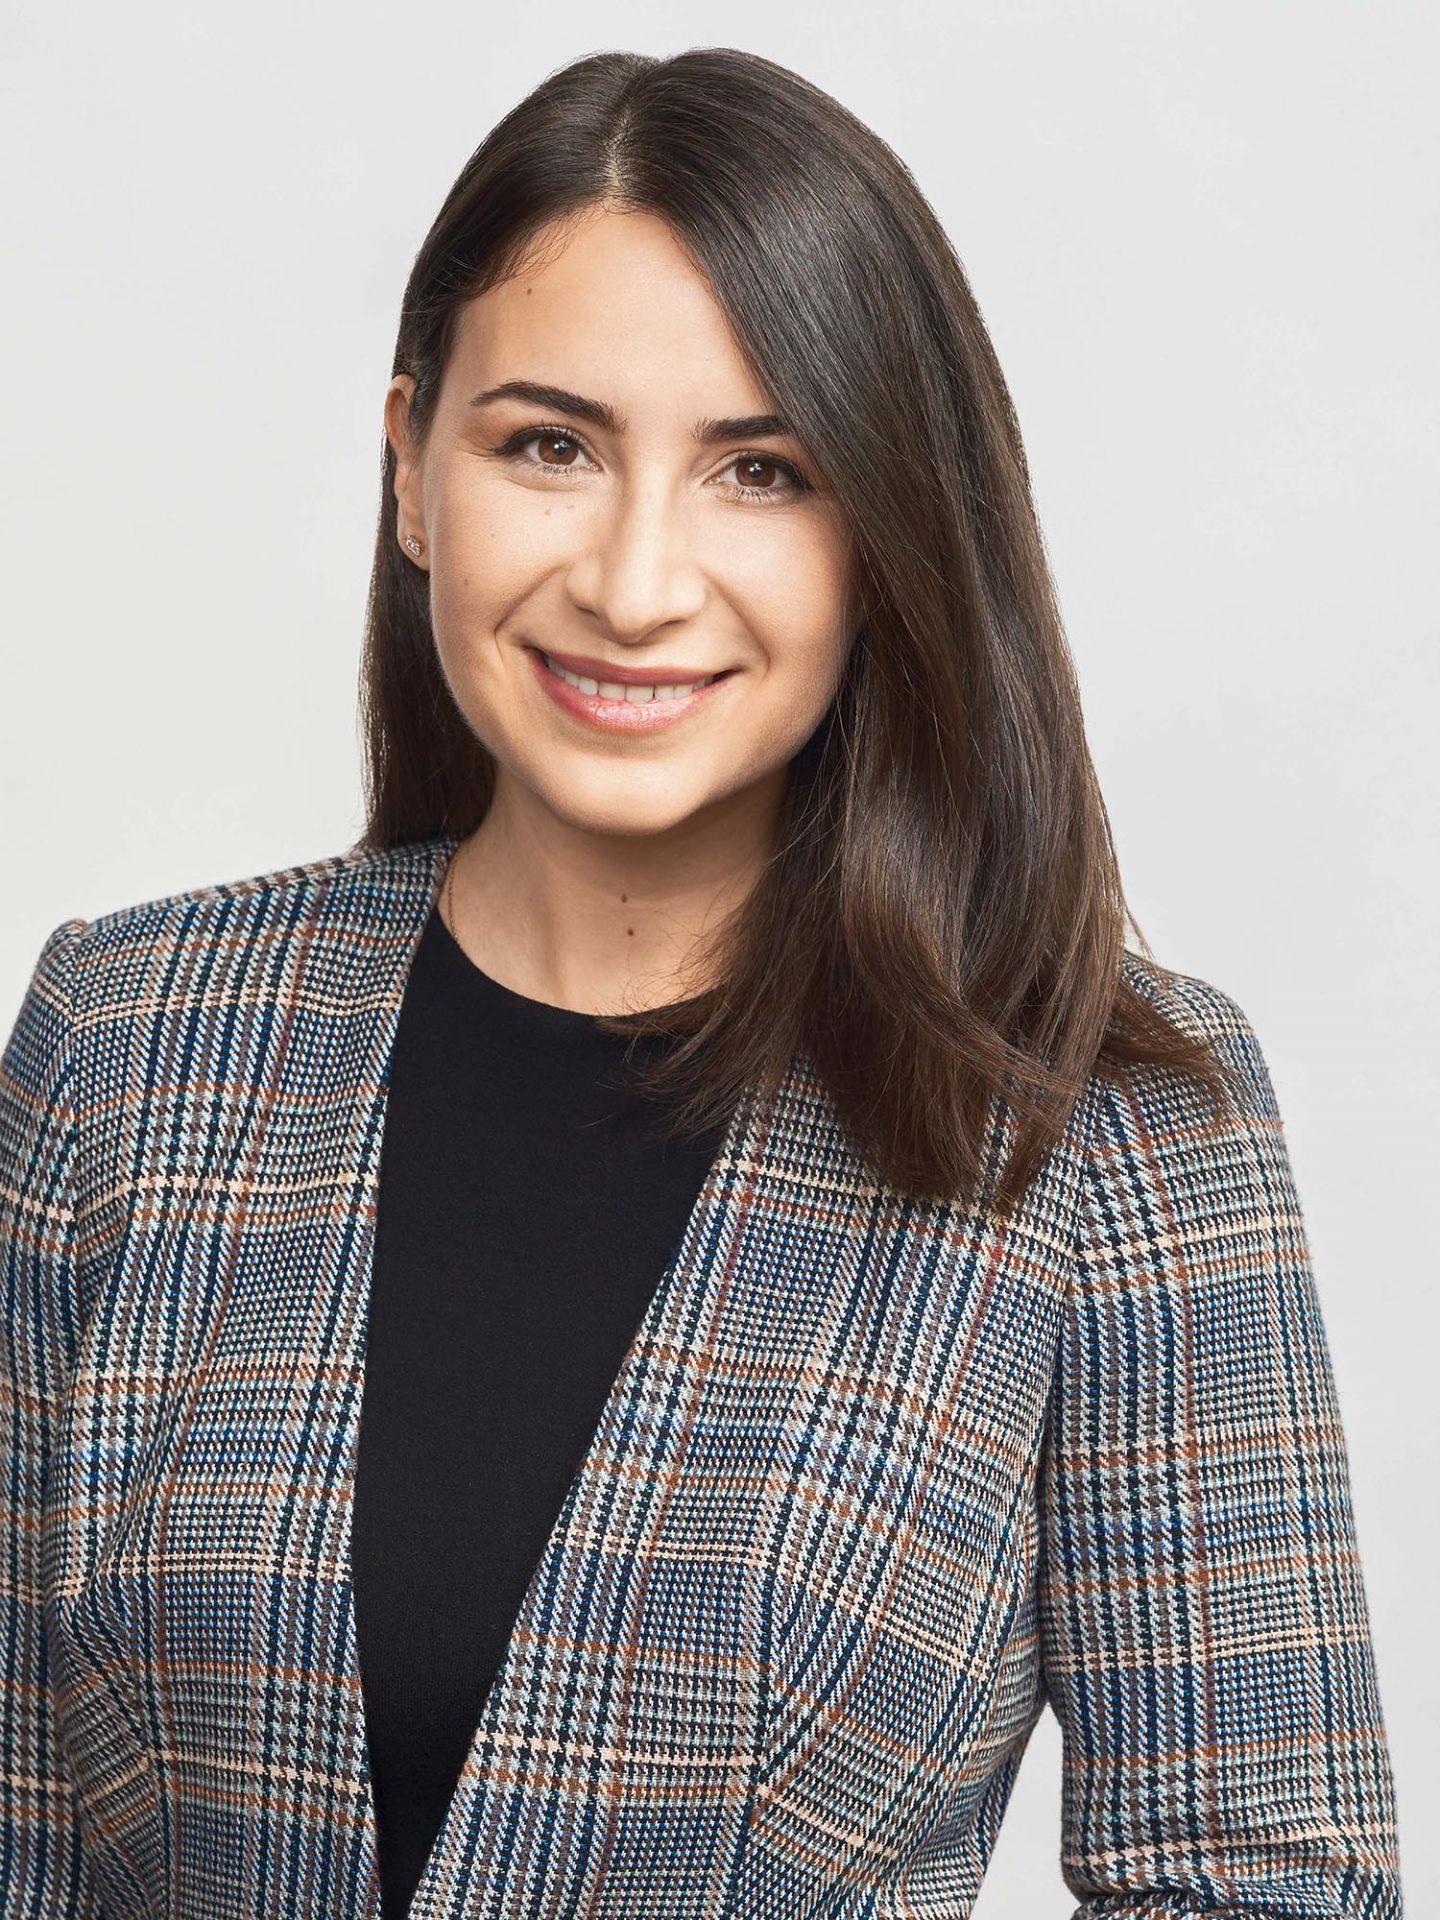 Alexandra Voyevodina, Endy